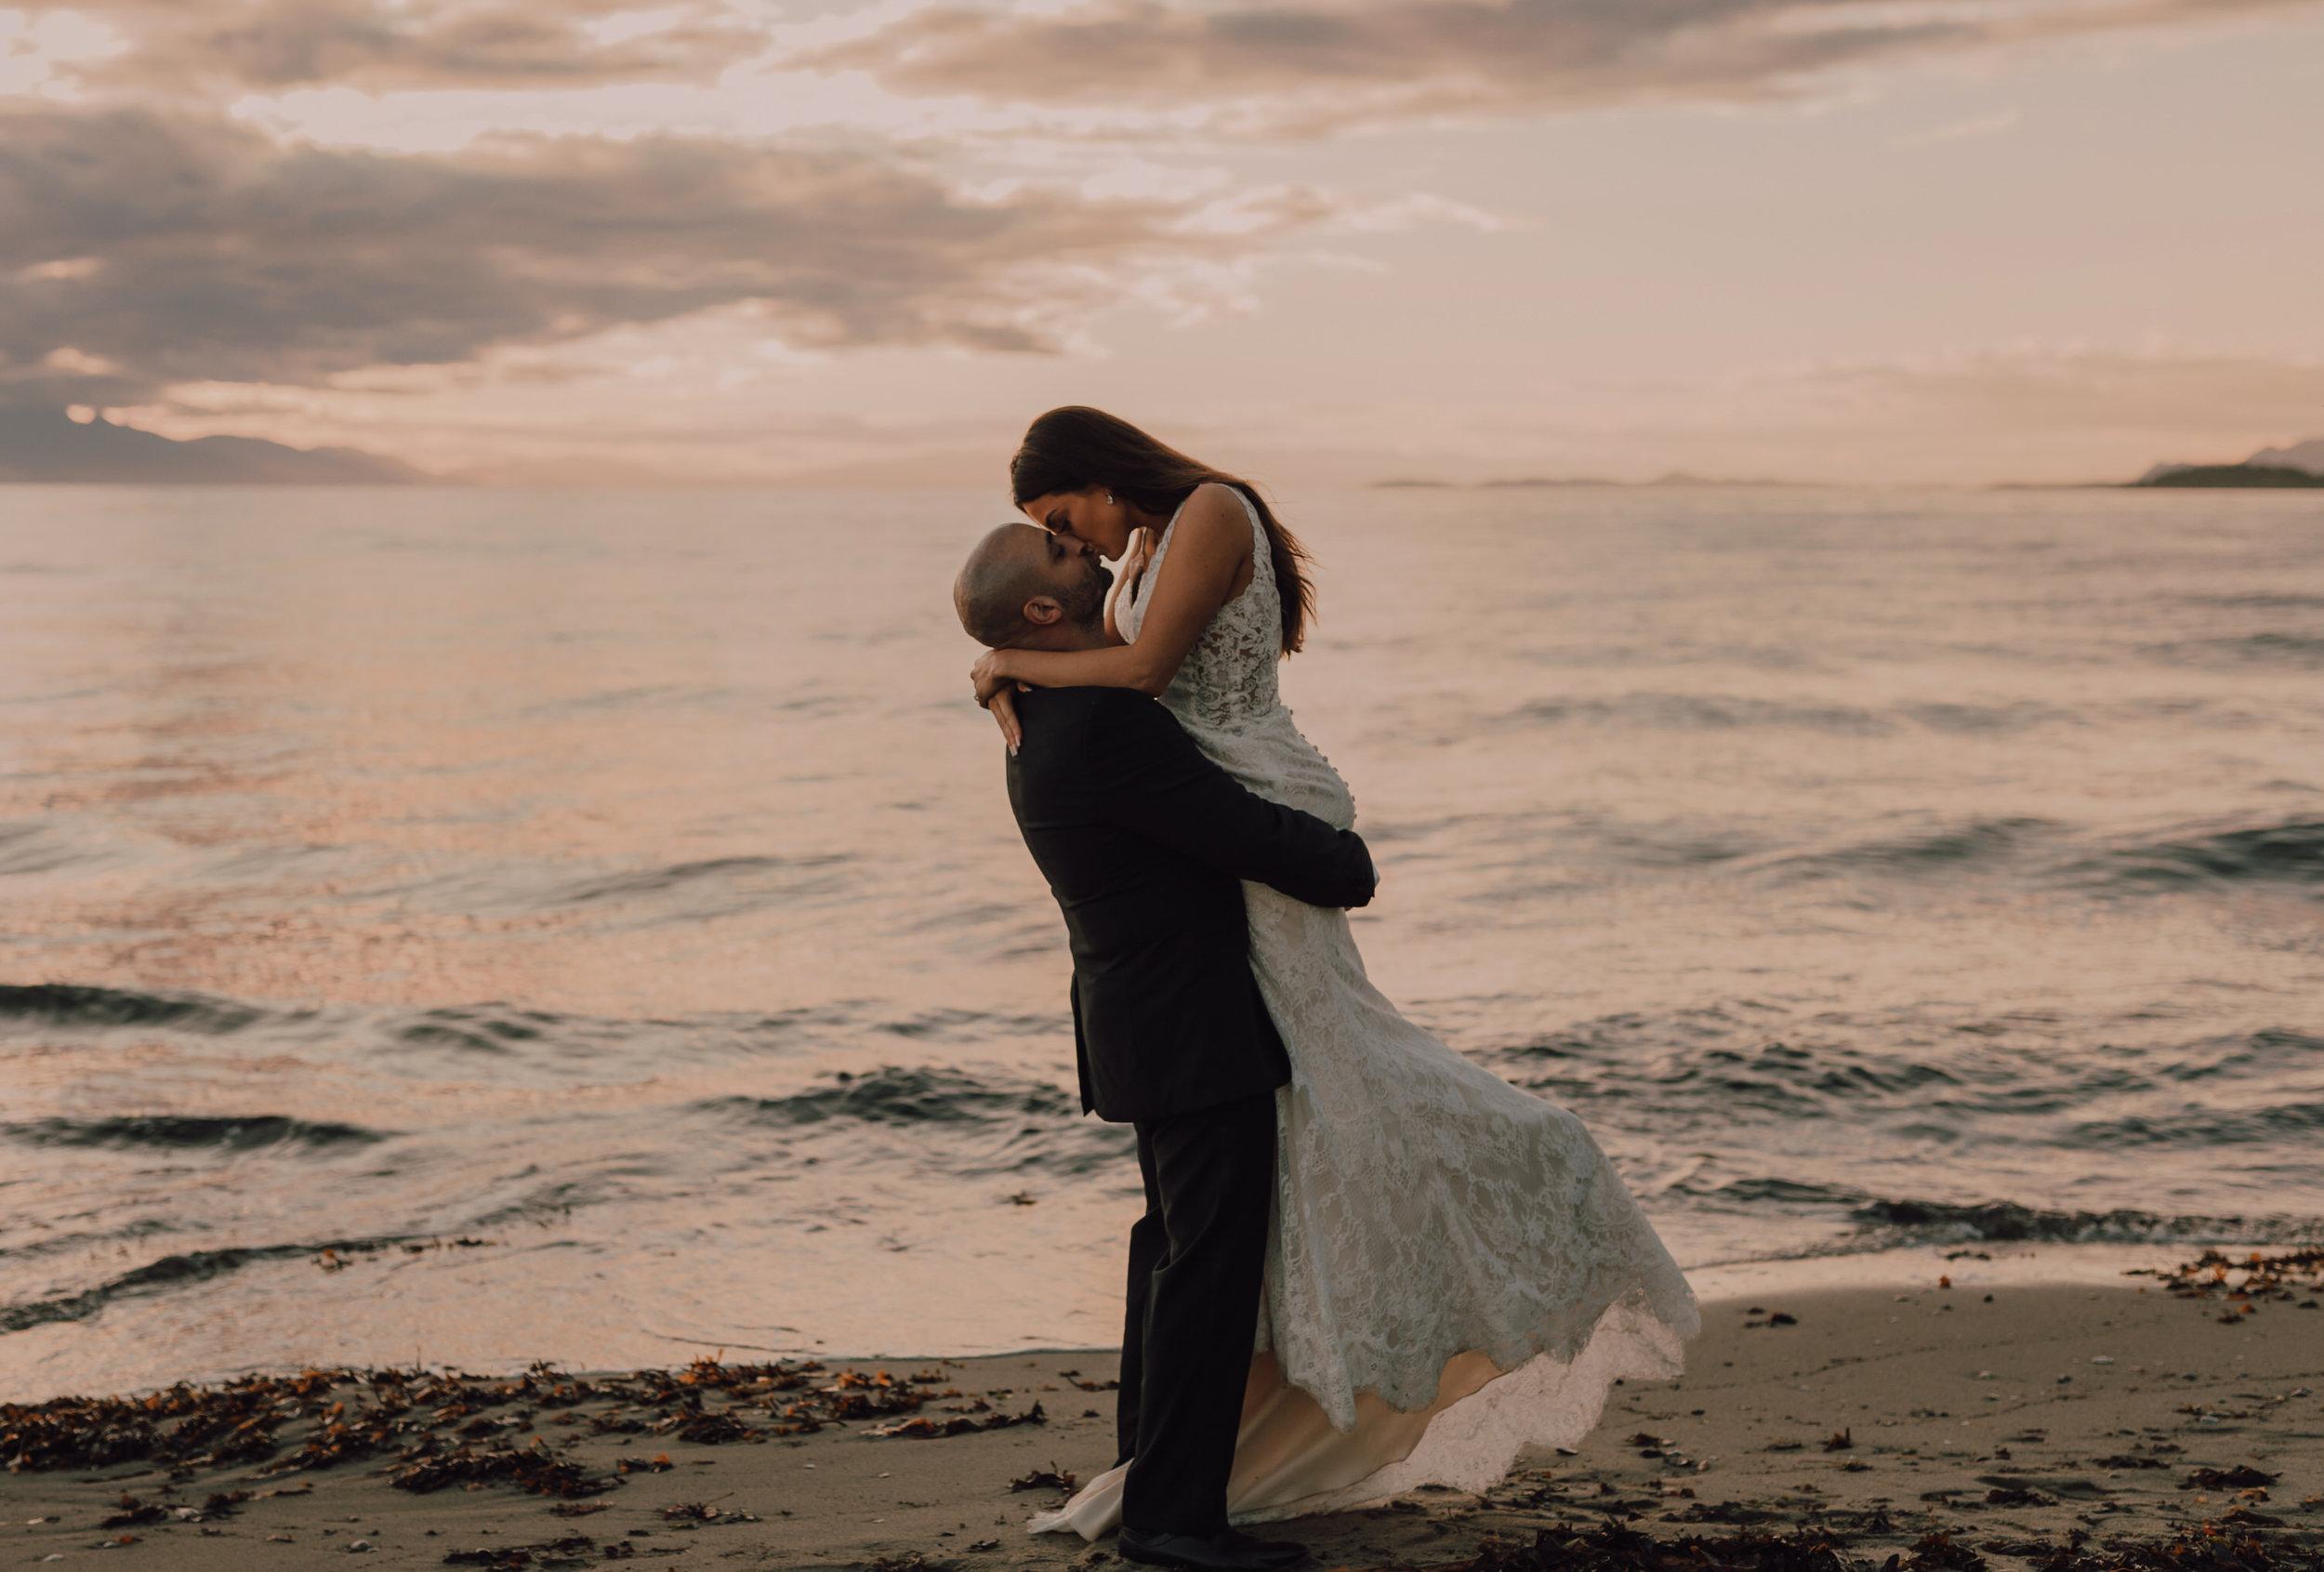 Day After Wedding Photos - Sunshine Coast Wedding Photos - Sunset Wedding Photos - Vancouver Wedding Photographer & Videographer - Sunshine Coast Wedding Photos - Sunshine Coast Wedding Photographer - Jennifer Picard Photography - 1A5A9345.jpg